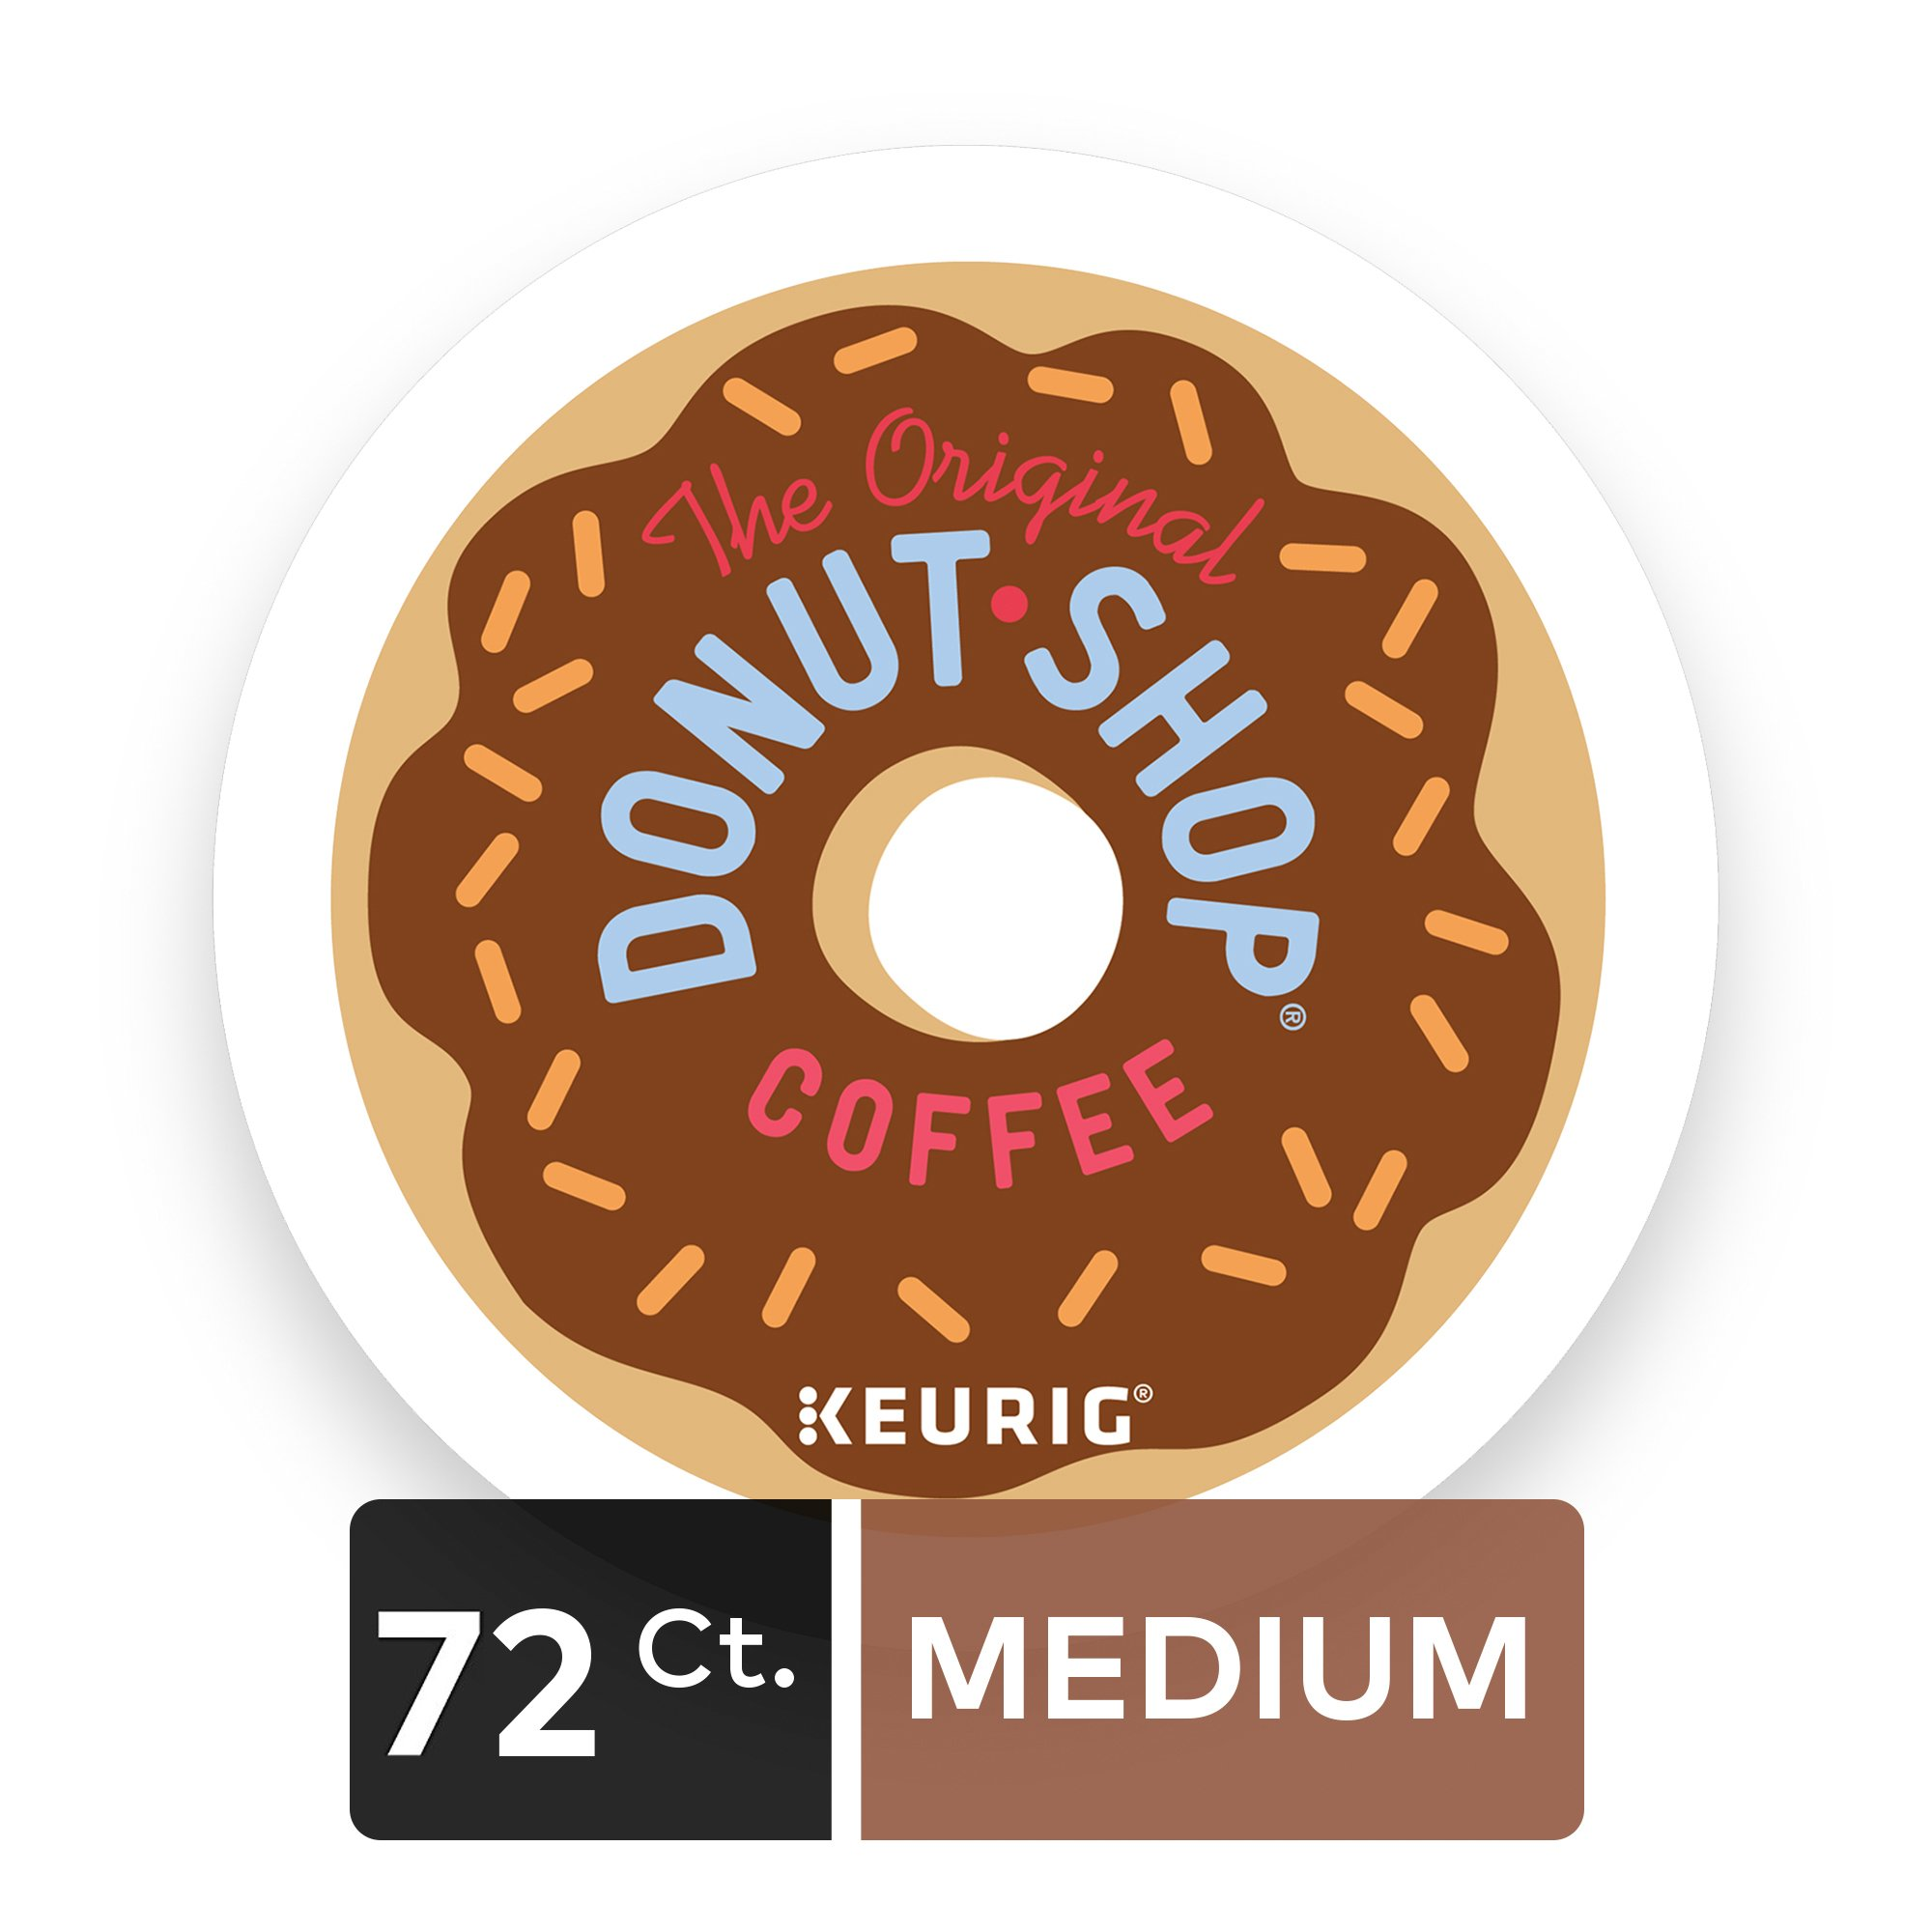 The Original Donut Shop Regular Keurig Single-Serve K-Cup Pods, Medium Roast Extra Bold Coffee, 72 Count (6 Boxes of 12 Pods)